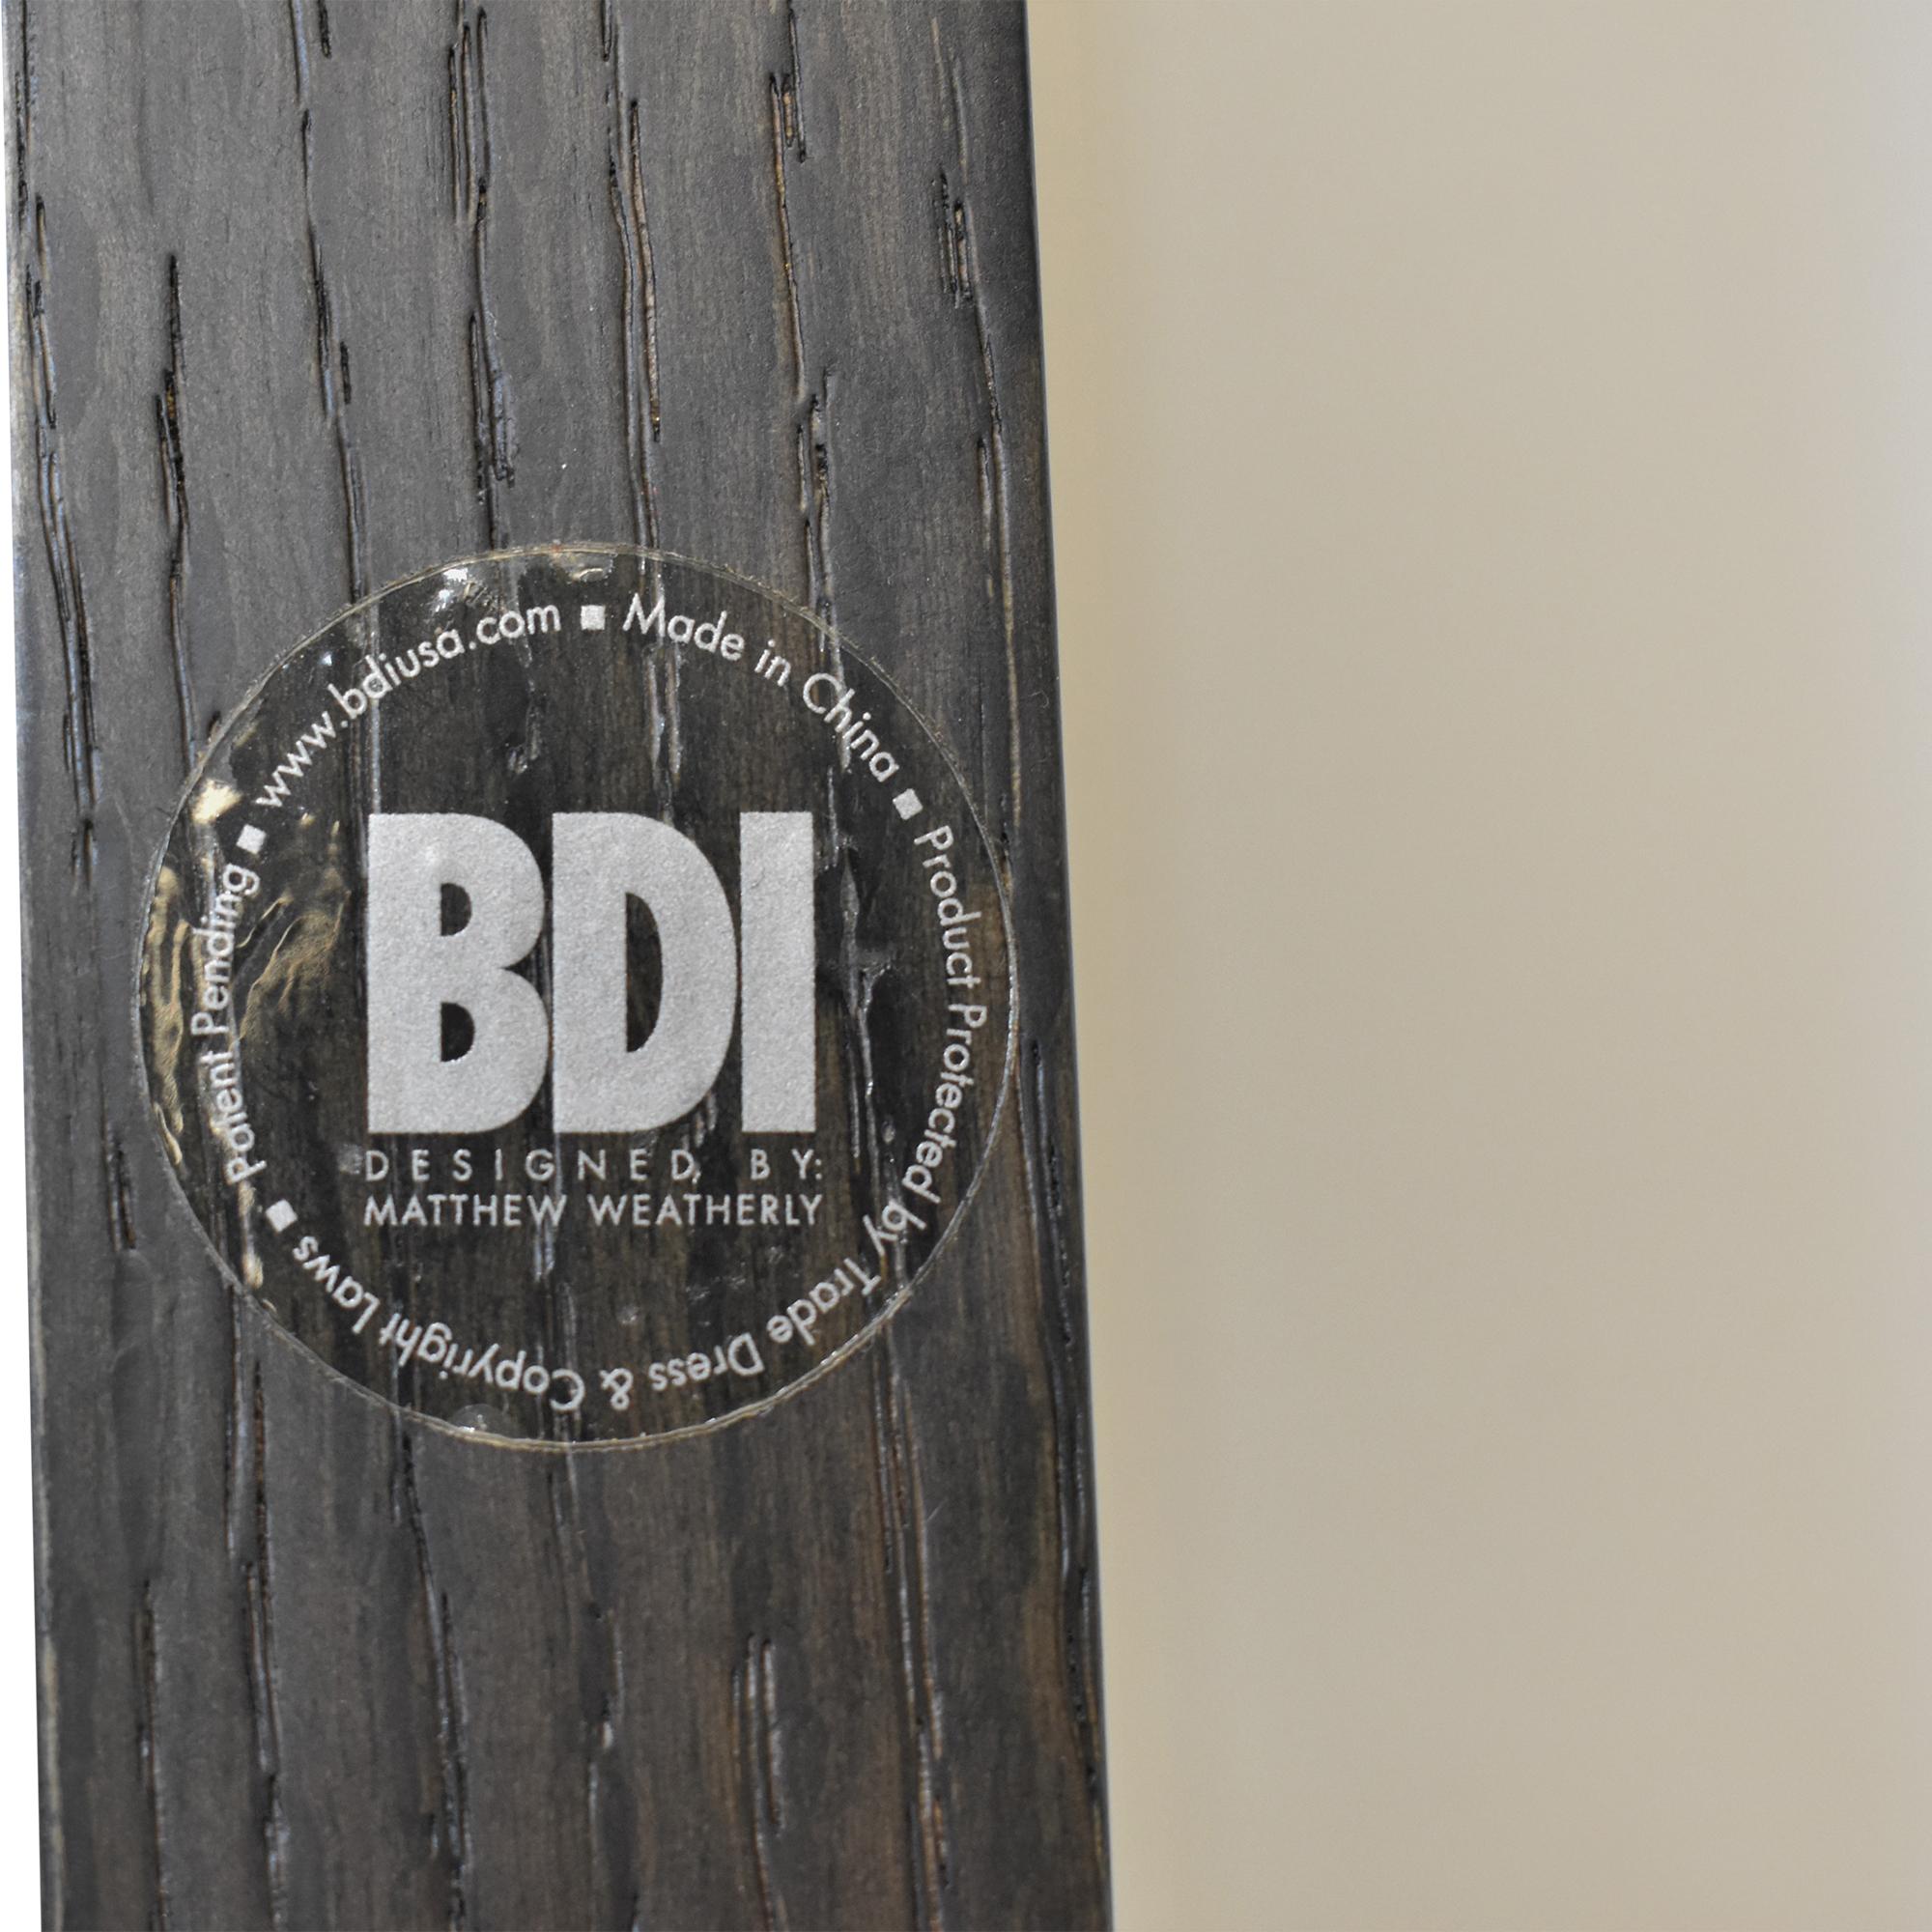 BDI Furniture Jensen-Lewis BDI Eileen Leaning Shelf nj